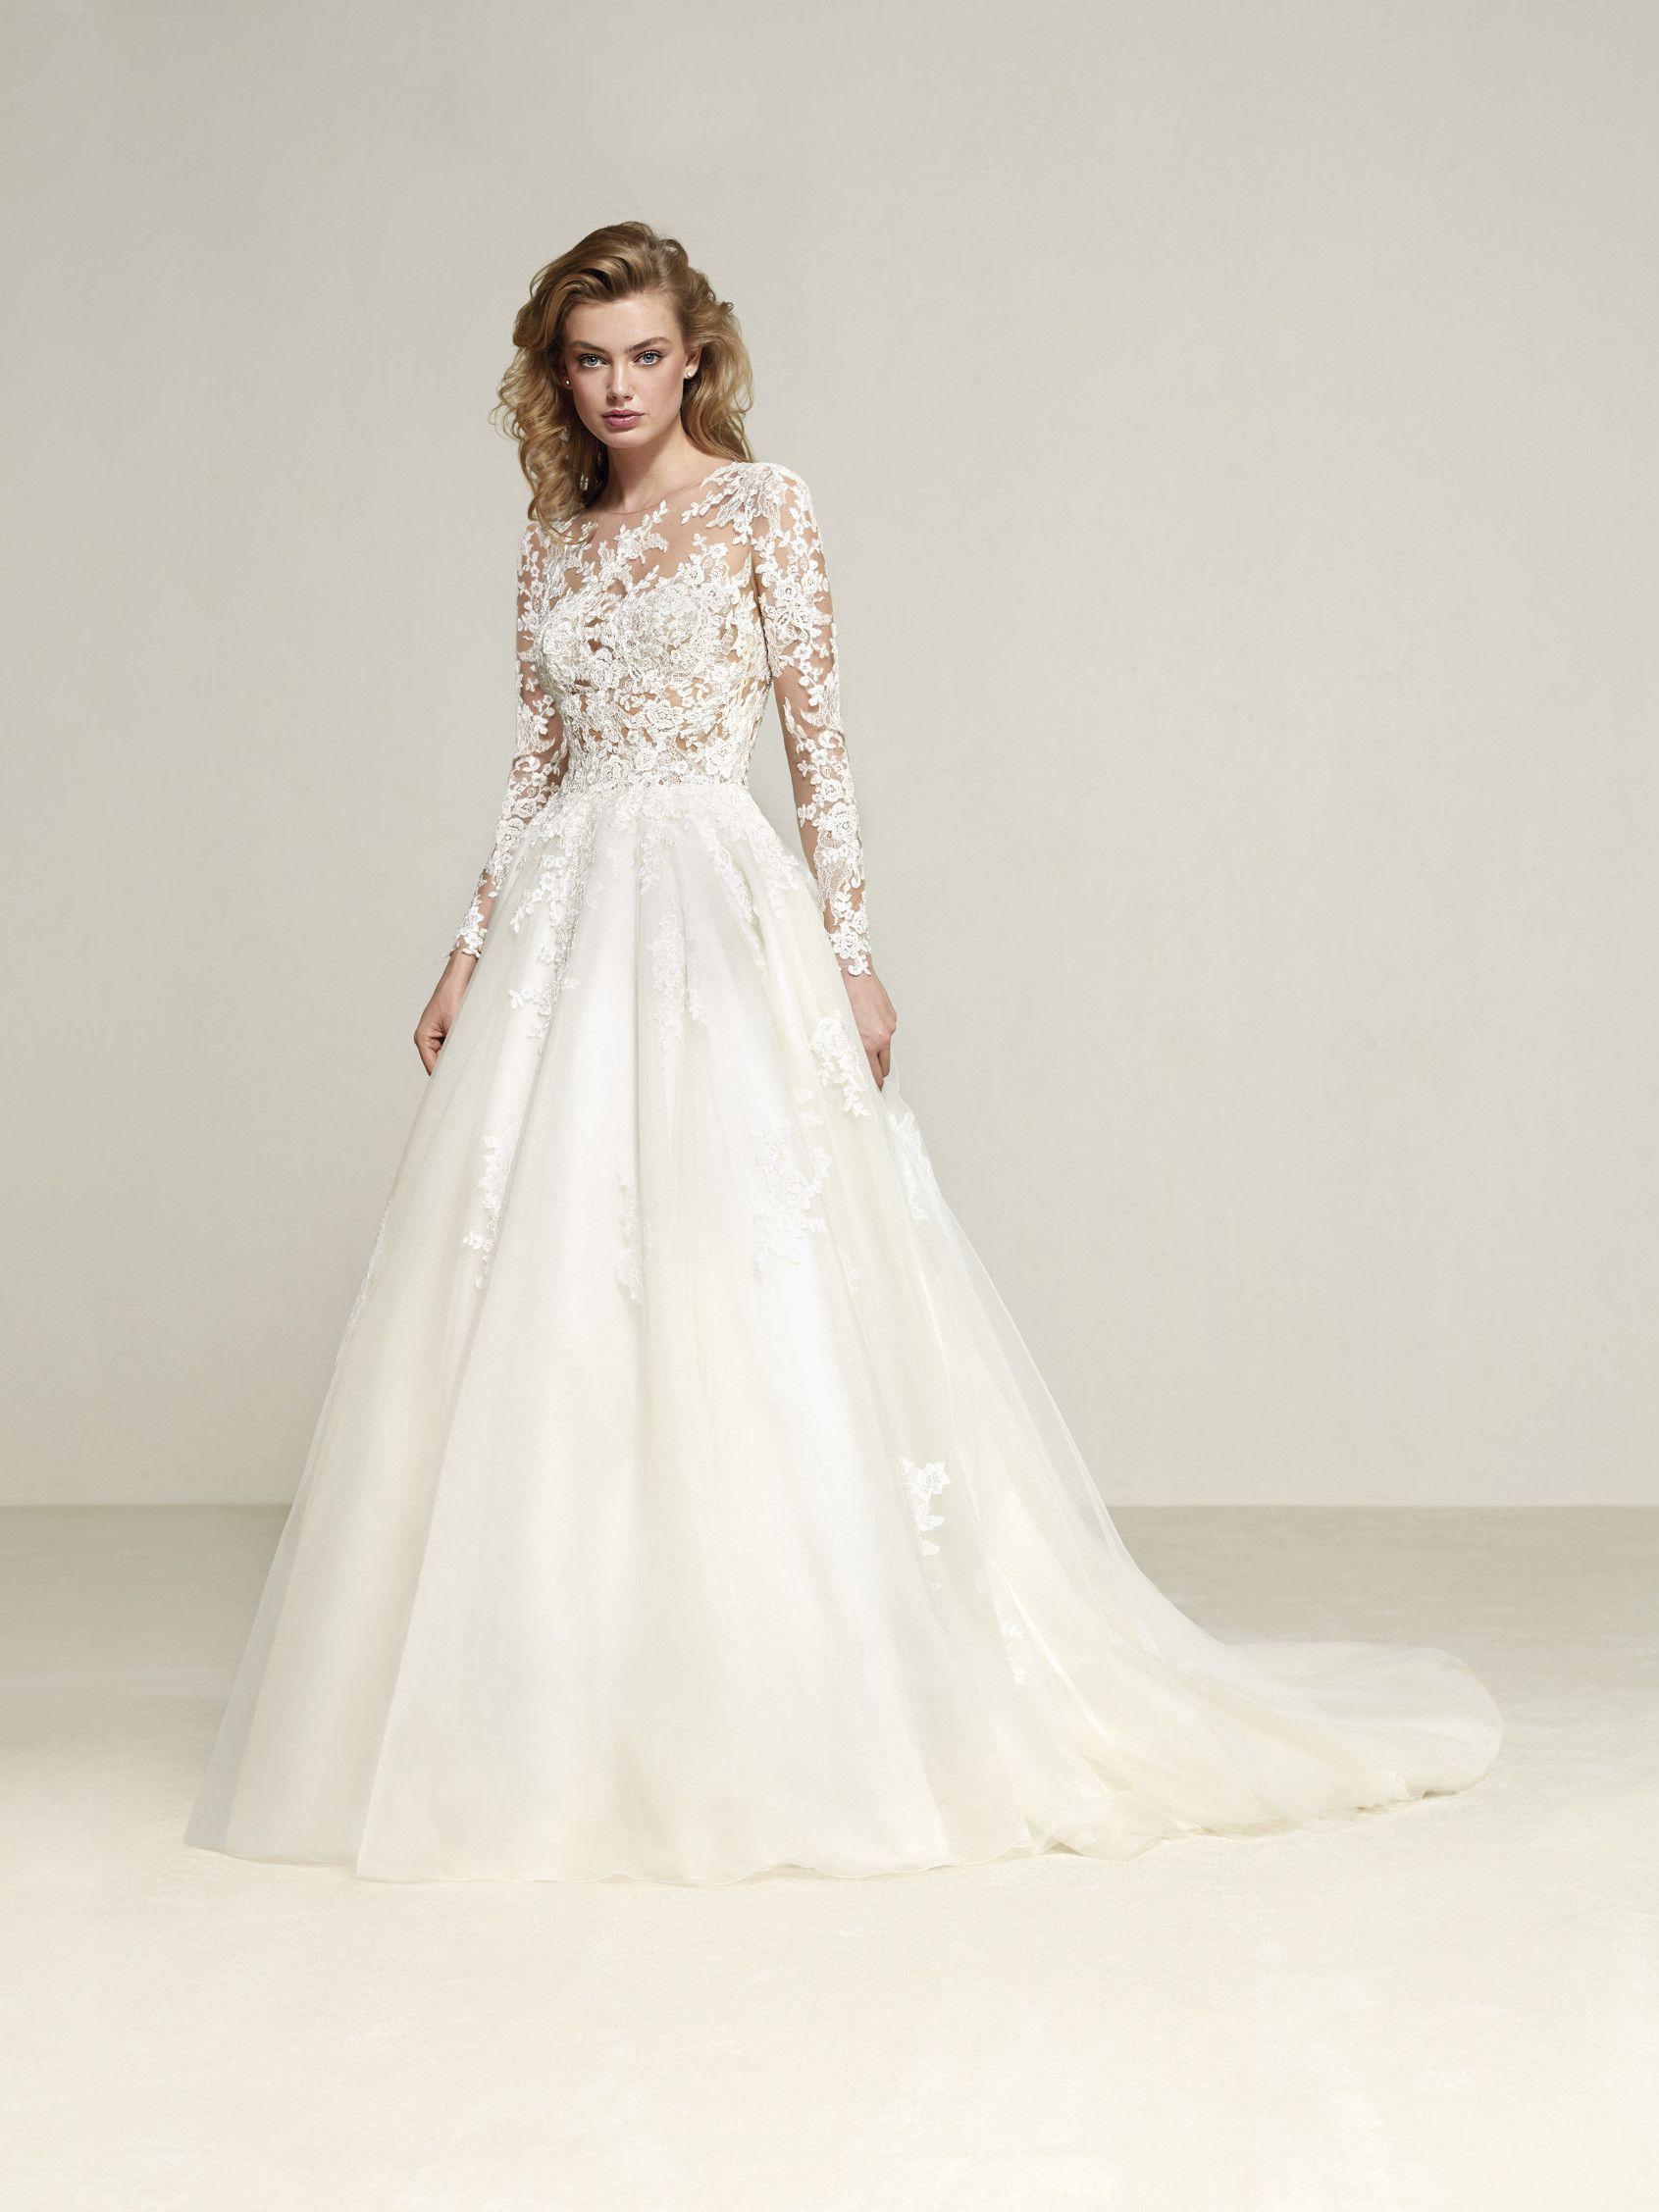 Märchenhaftes Brautkleid - Drizana | Wedding | Pinterest ...